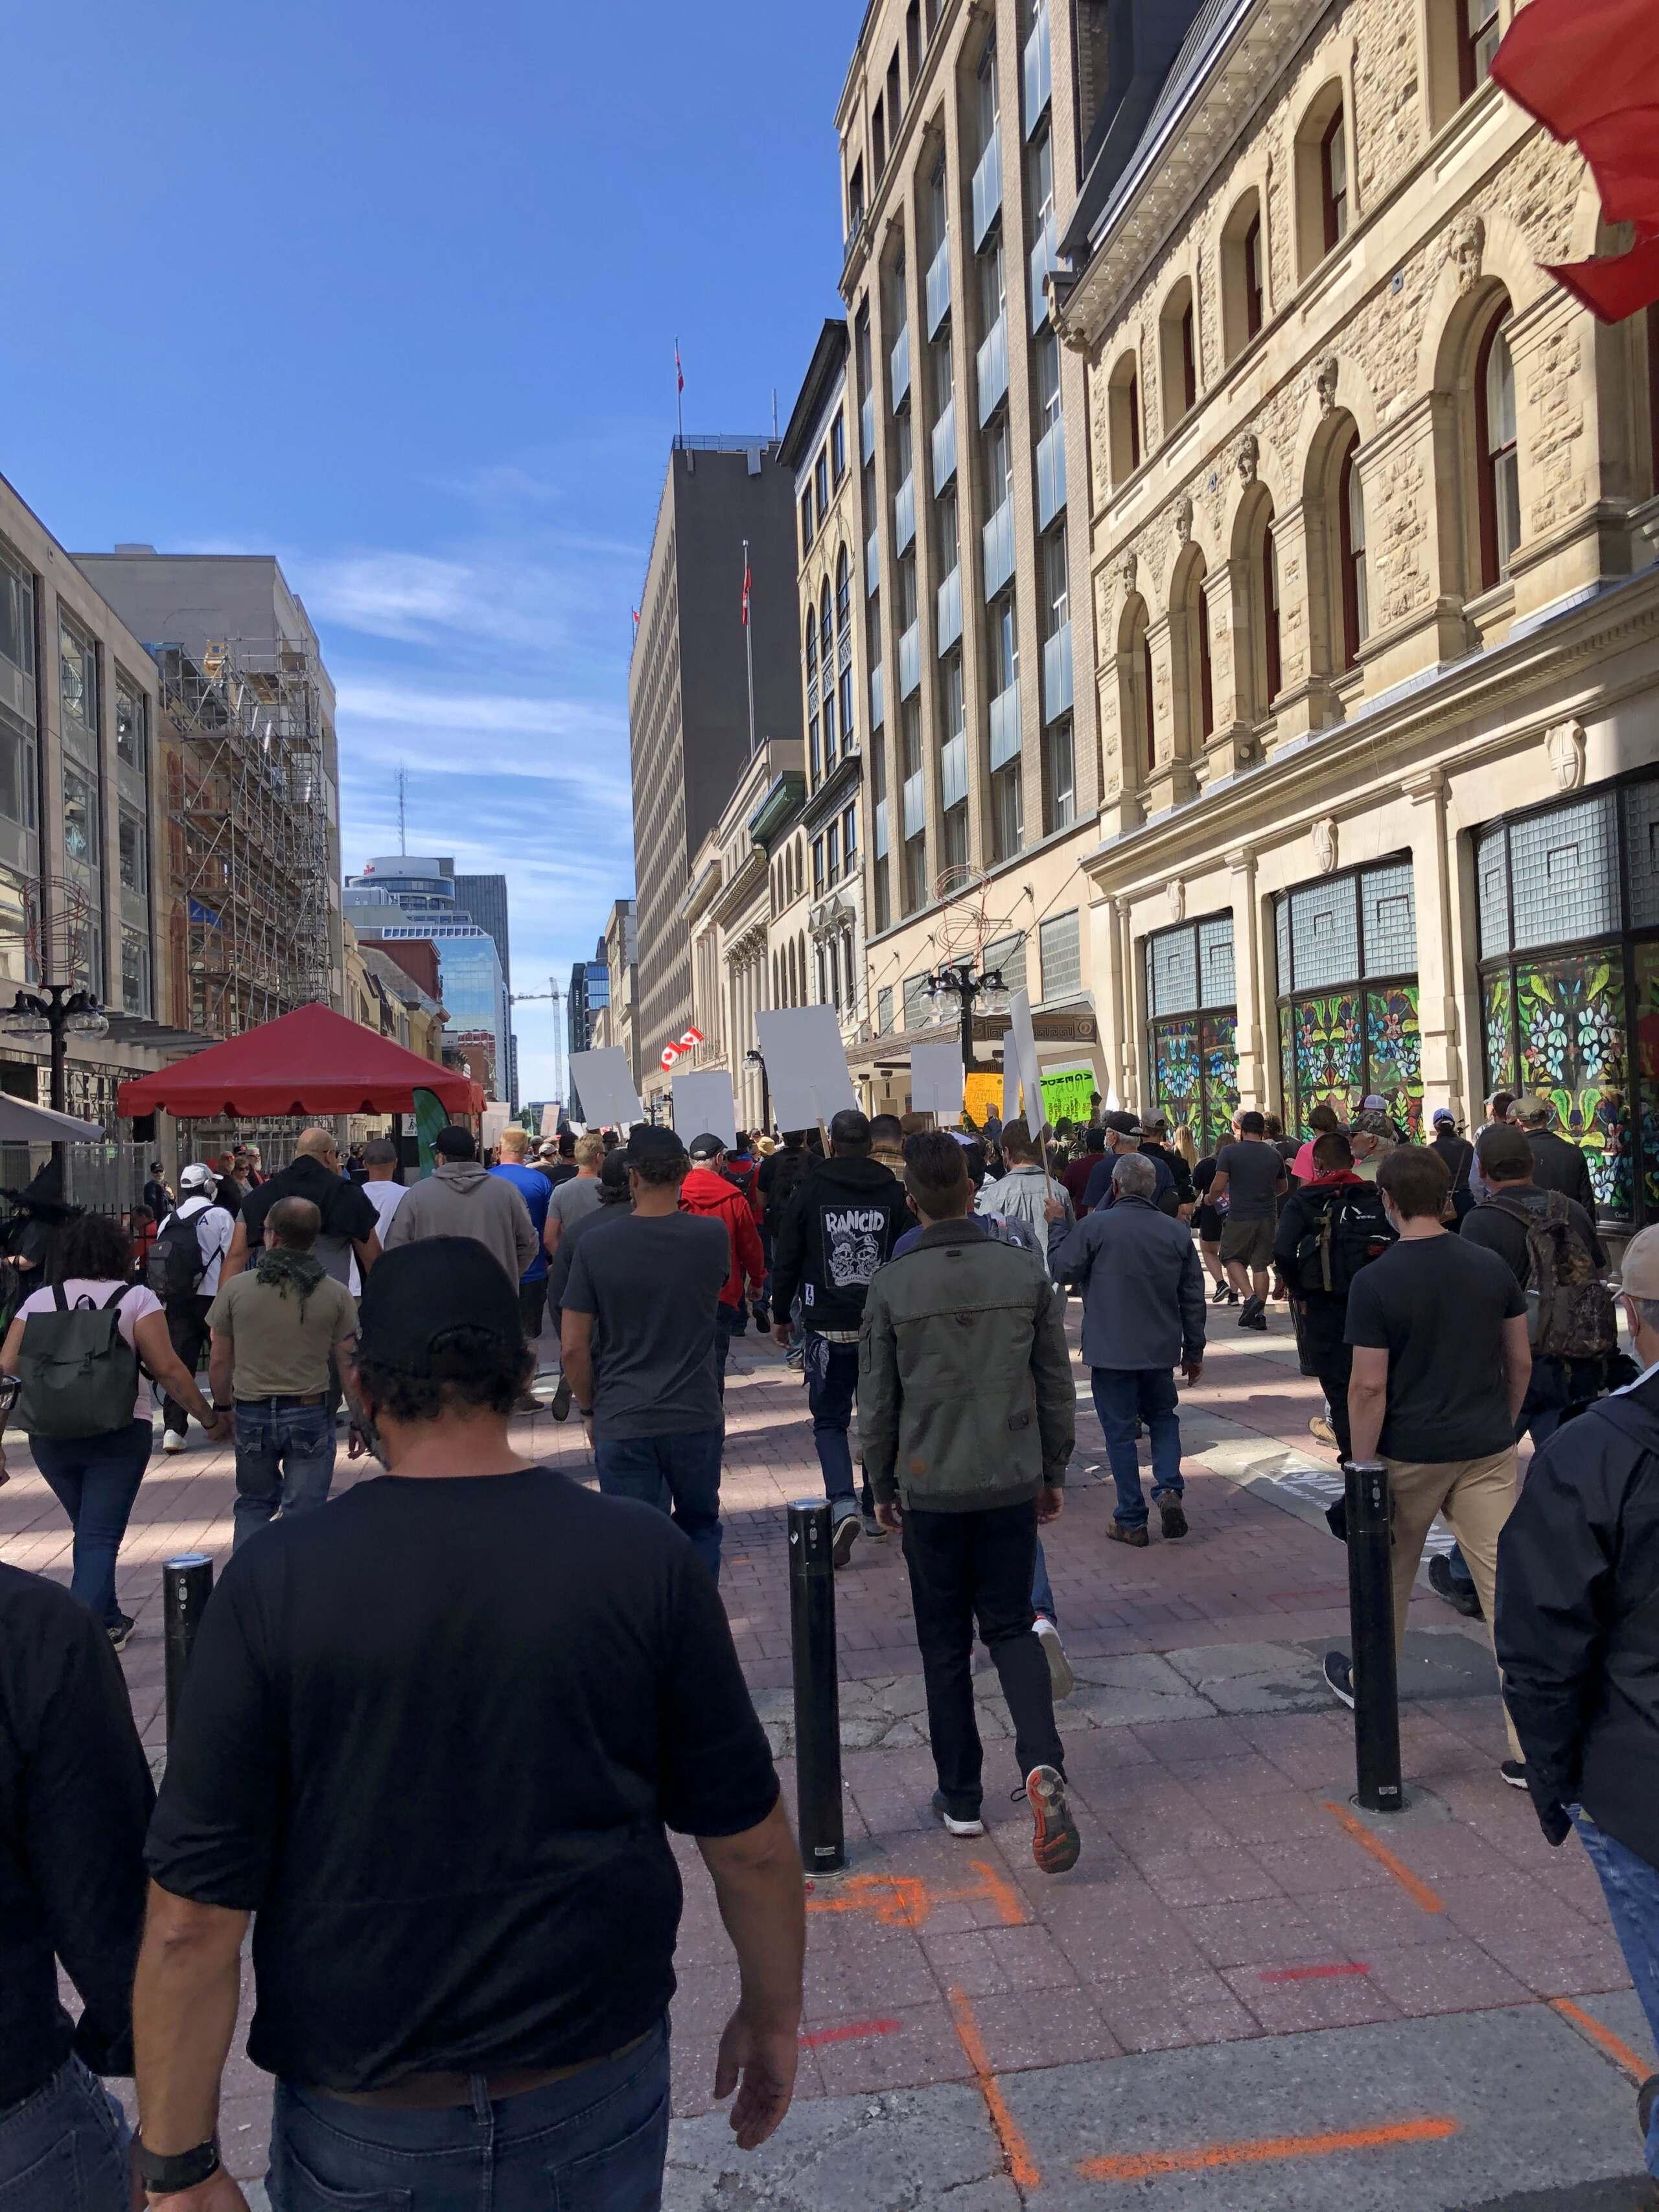 Manifestation CCFR à Ottawa le 12 sept 20 - Page 4 Img_5914